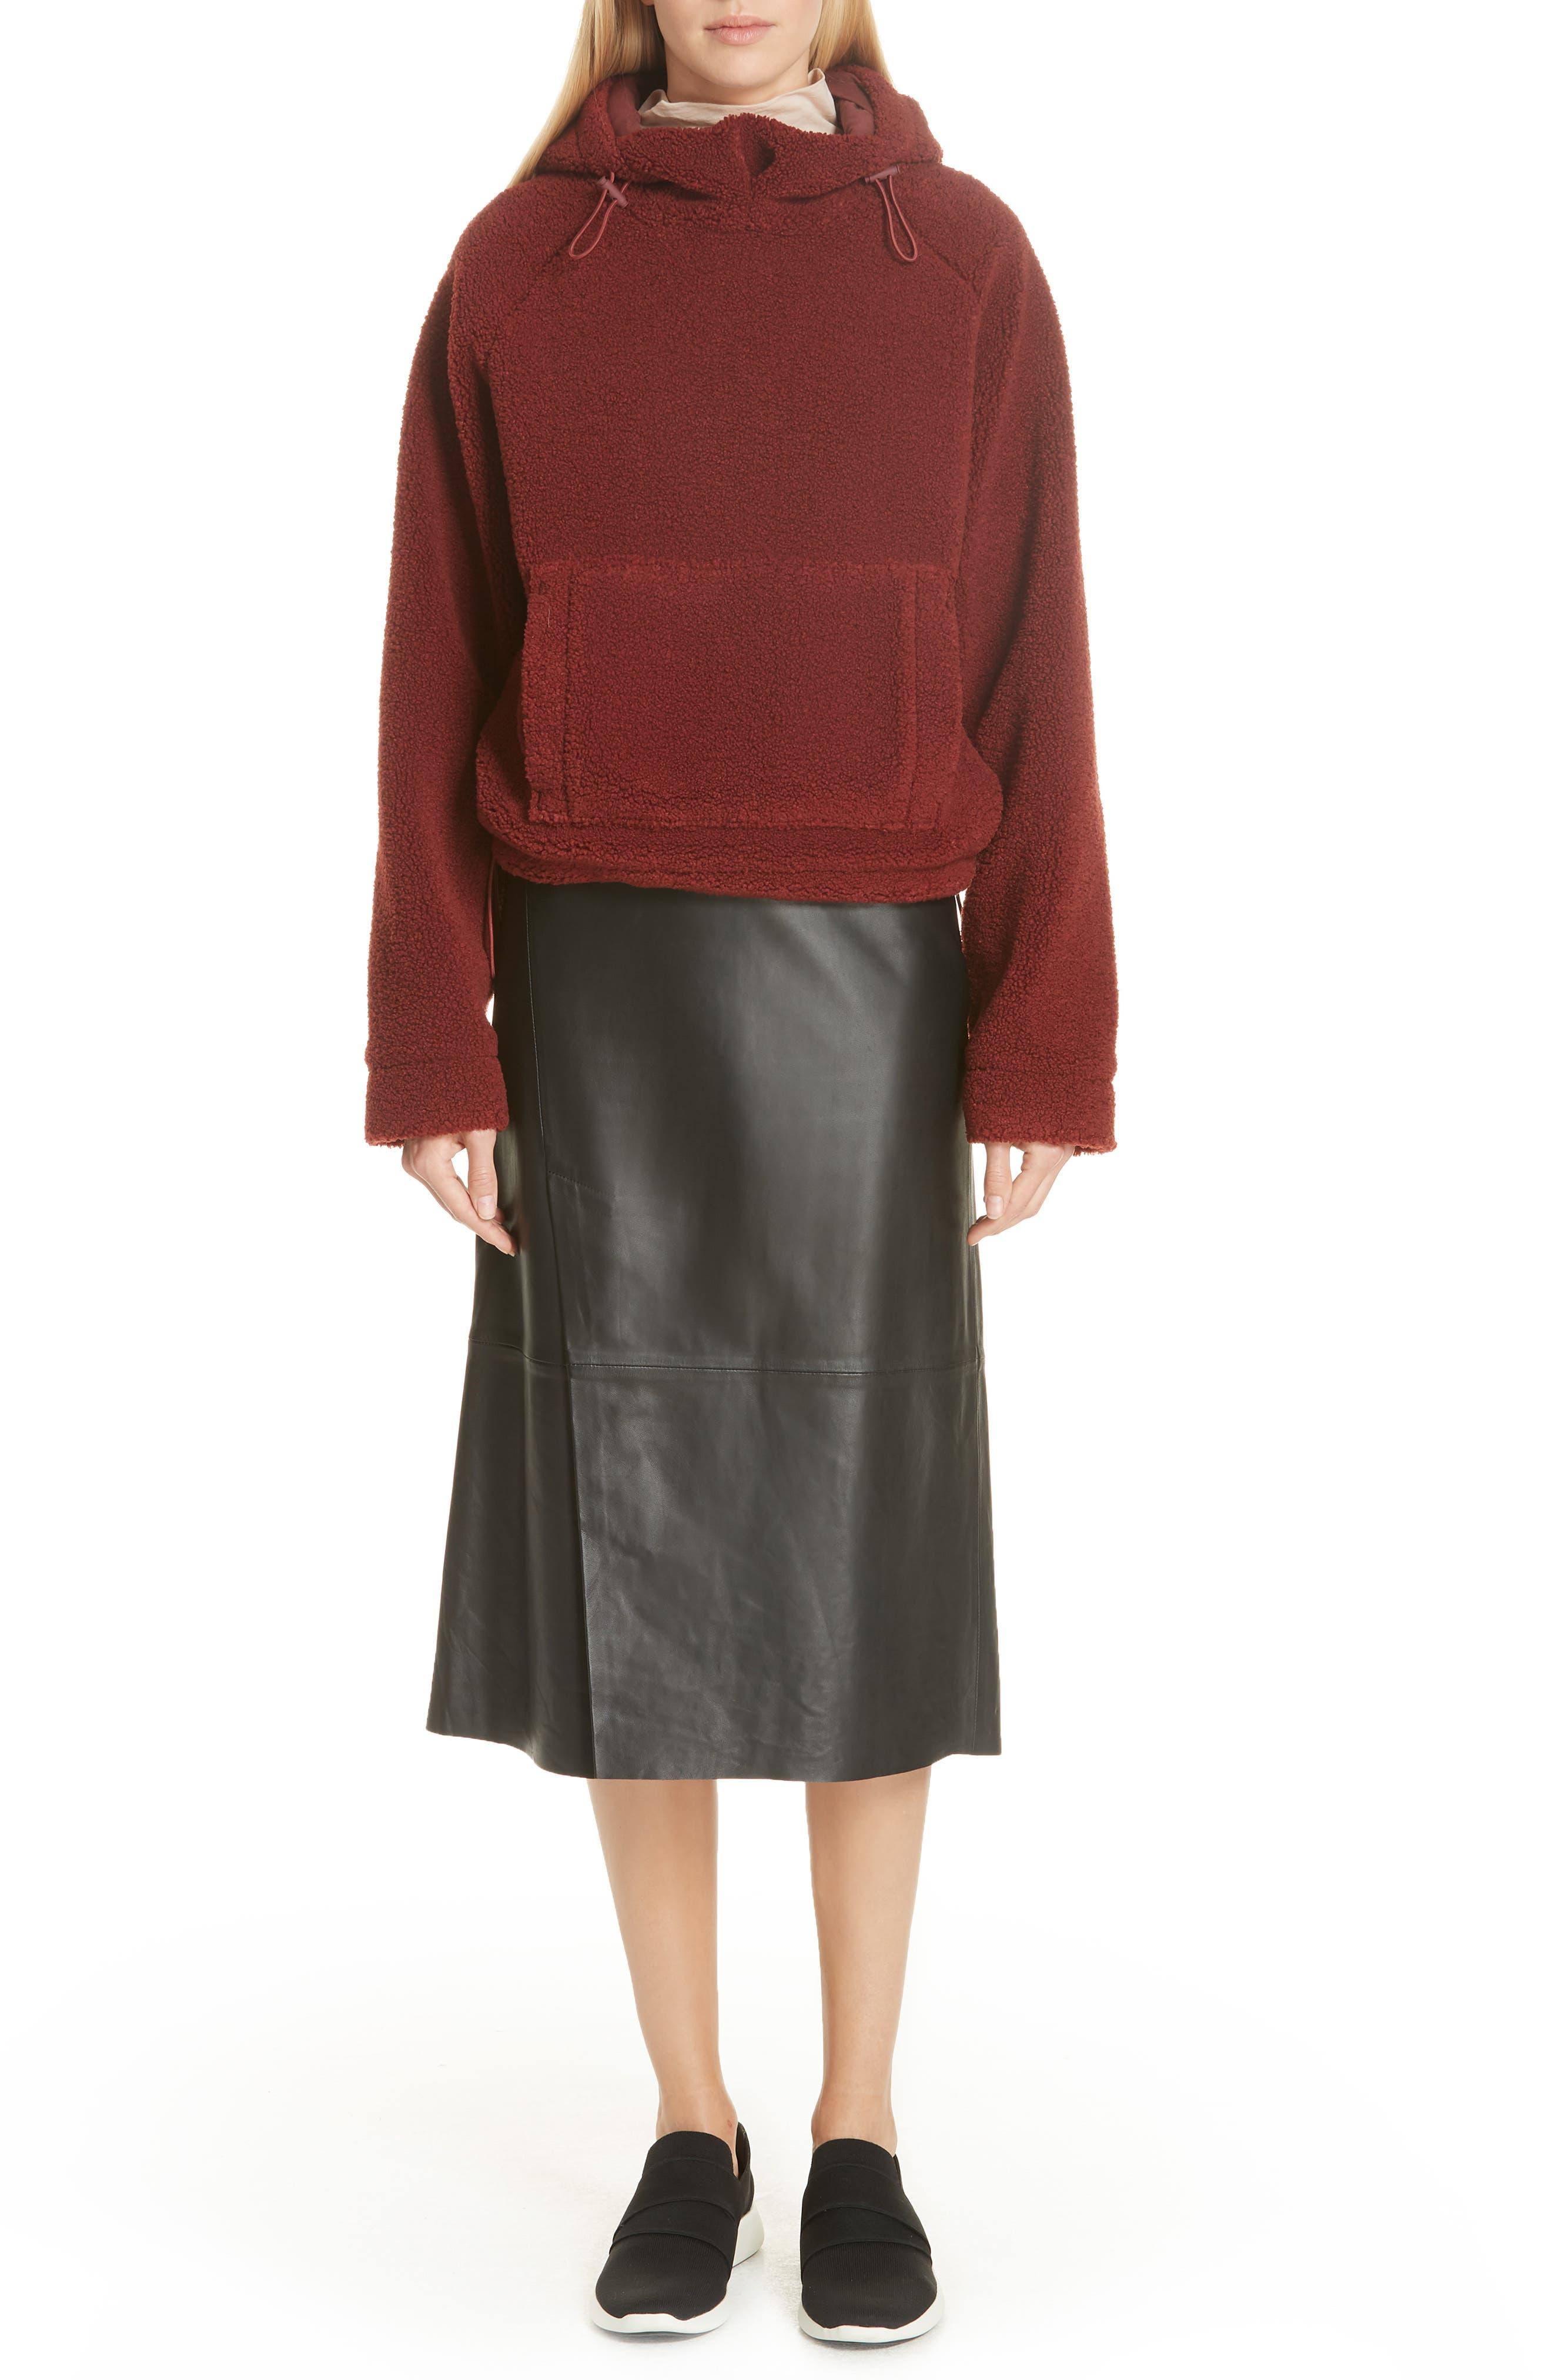 Slit Leather Midi Skirt in Black